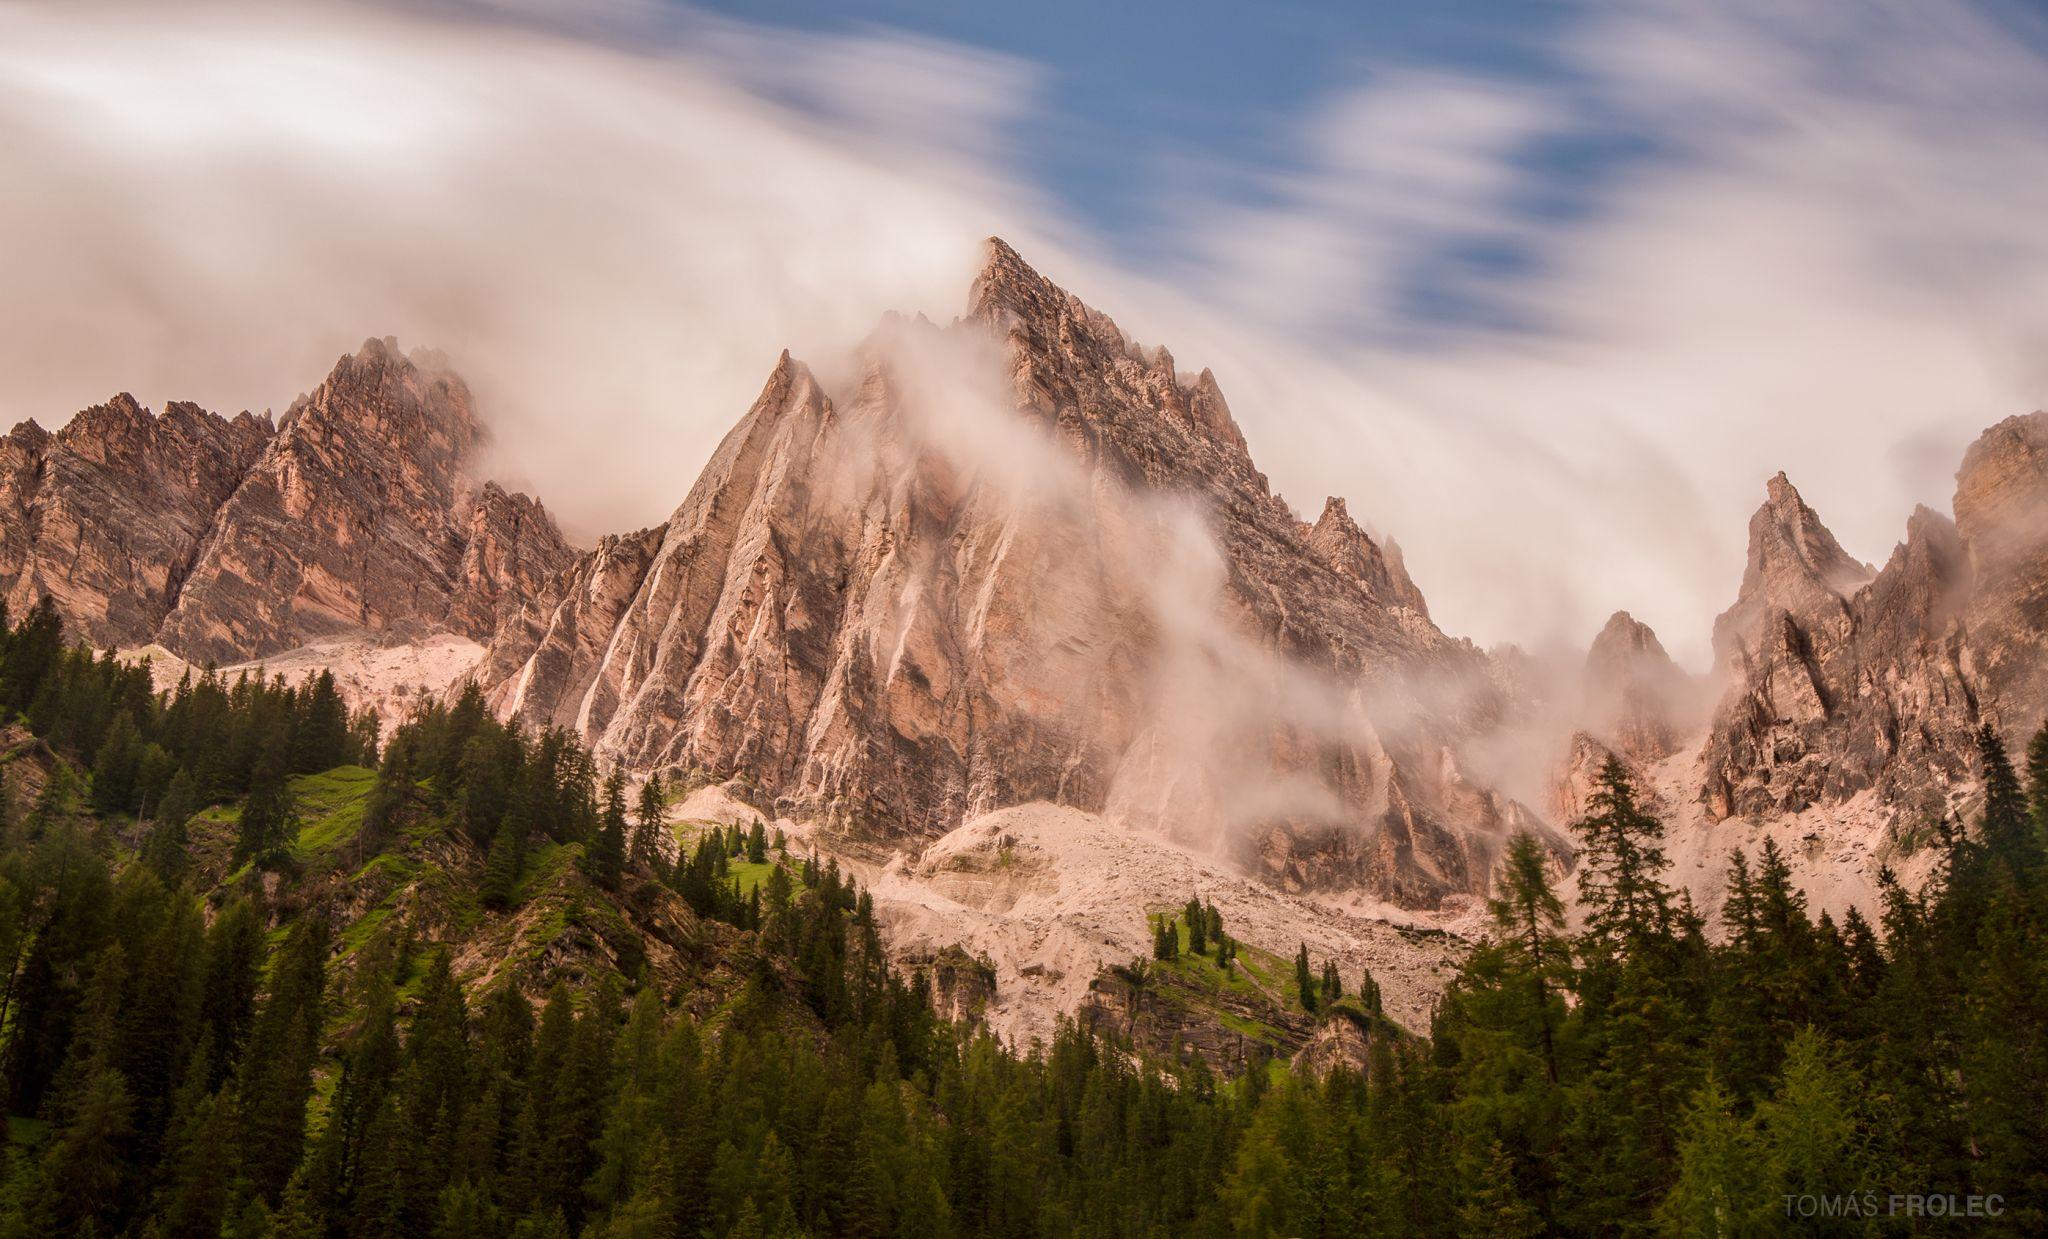 Monte Cristalo, Italy